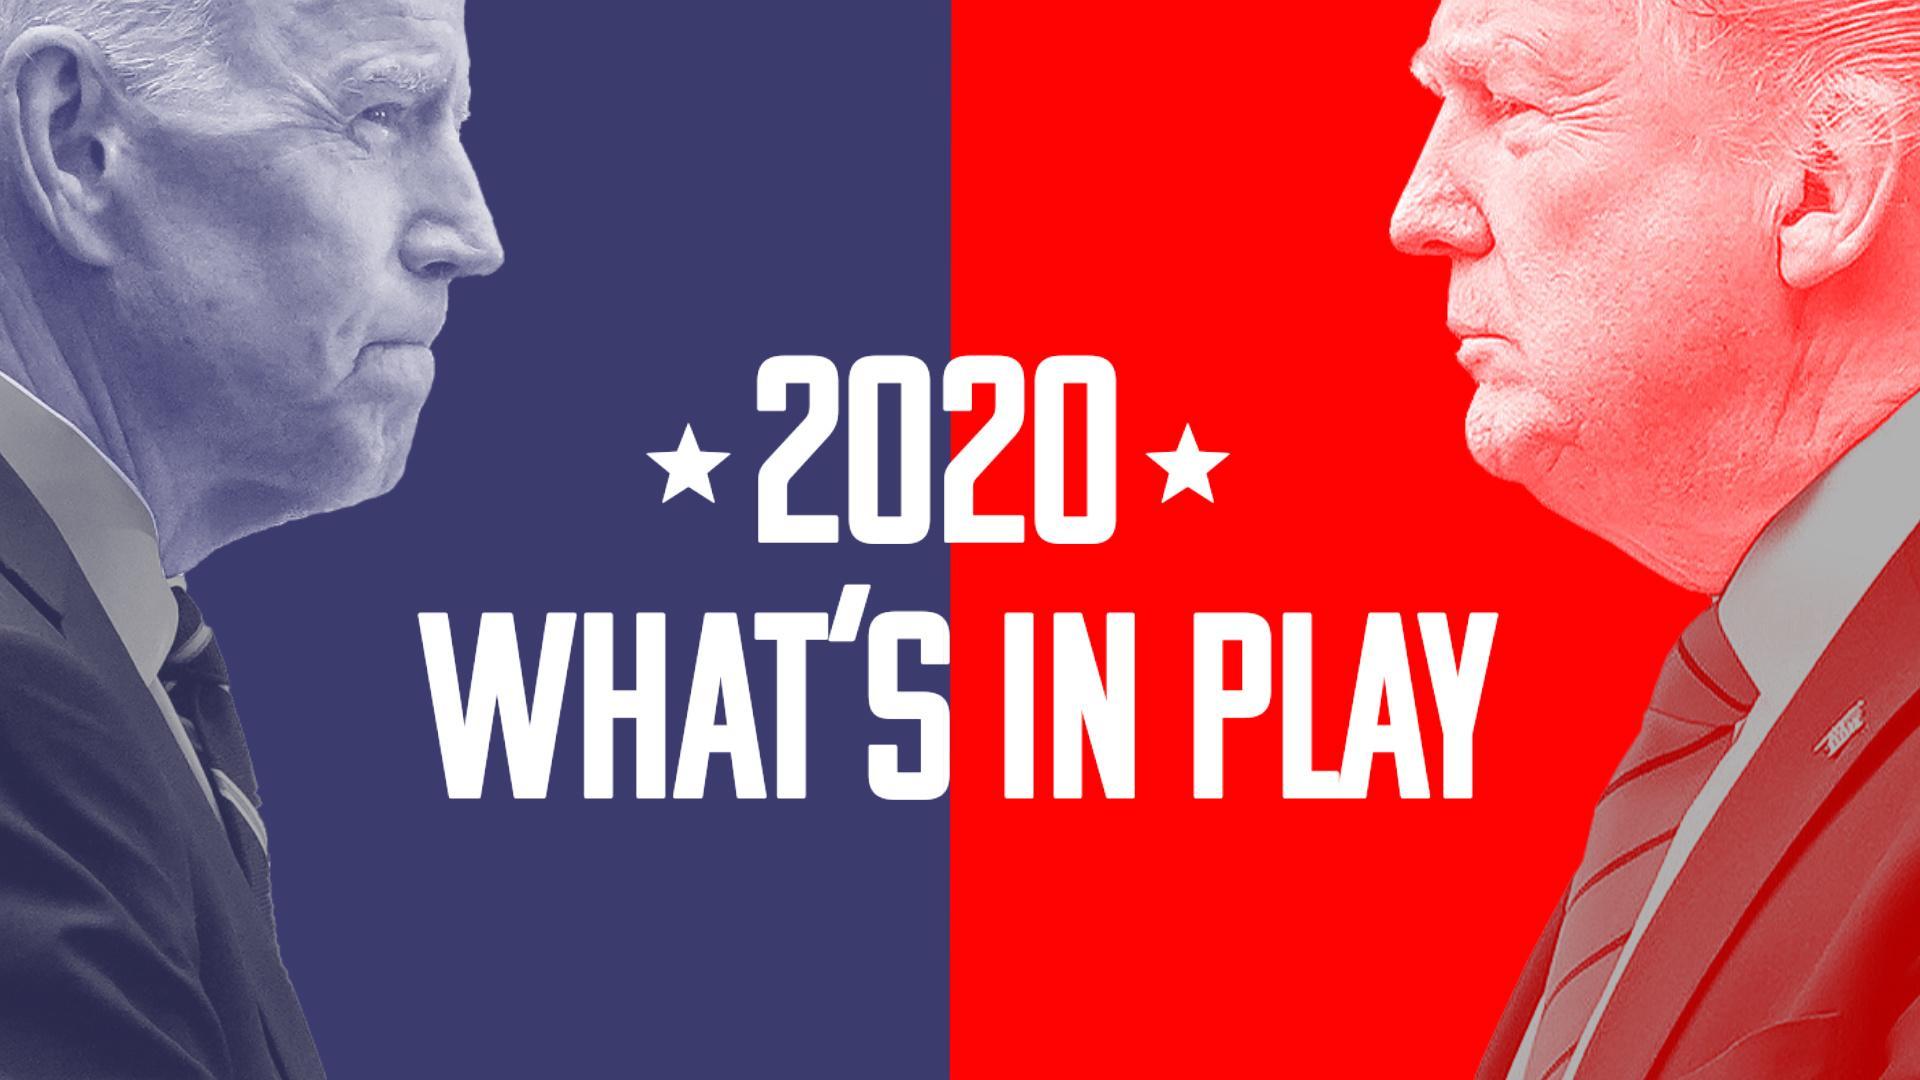 What's in Play: Trump-Biden healthcare showdown in the spotlight